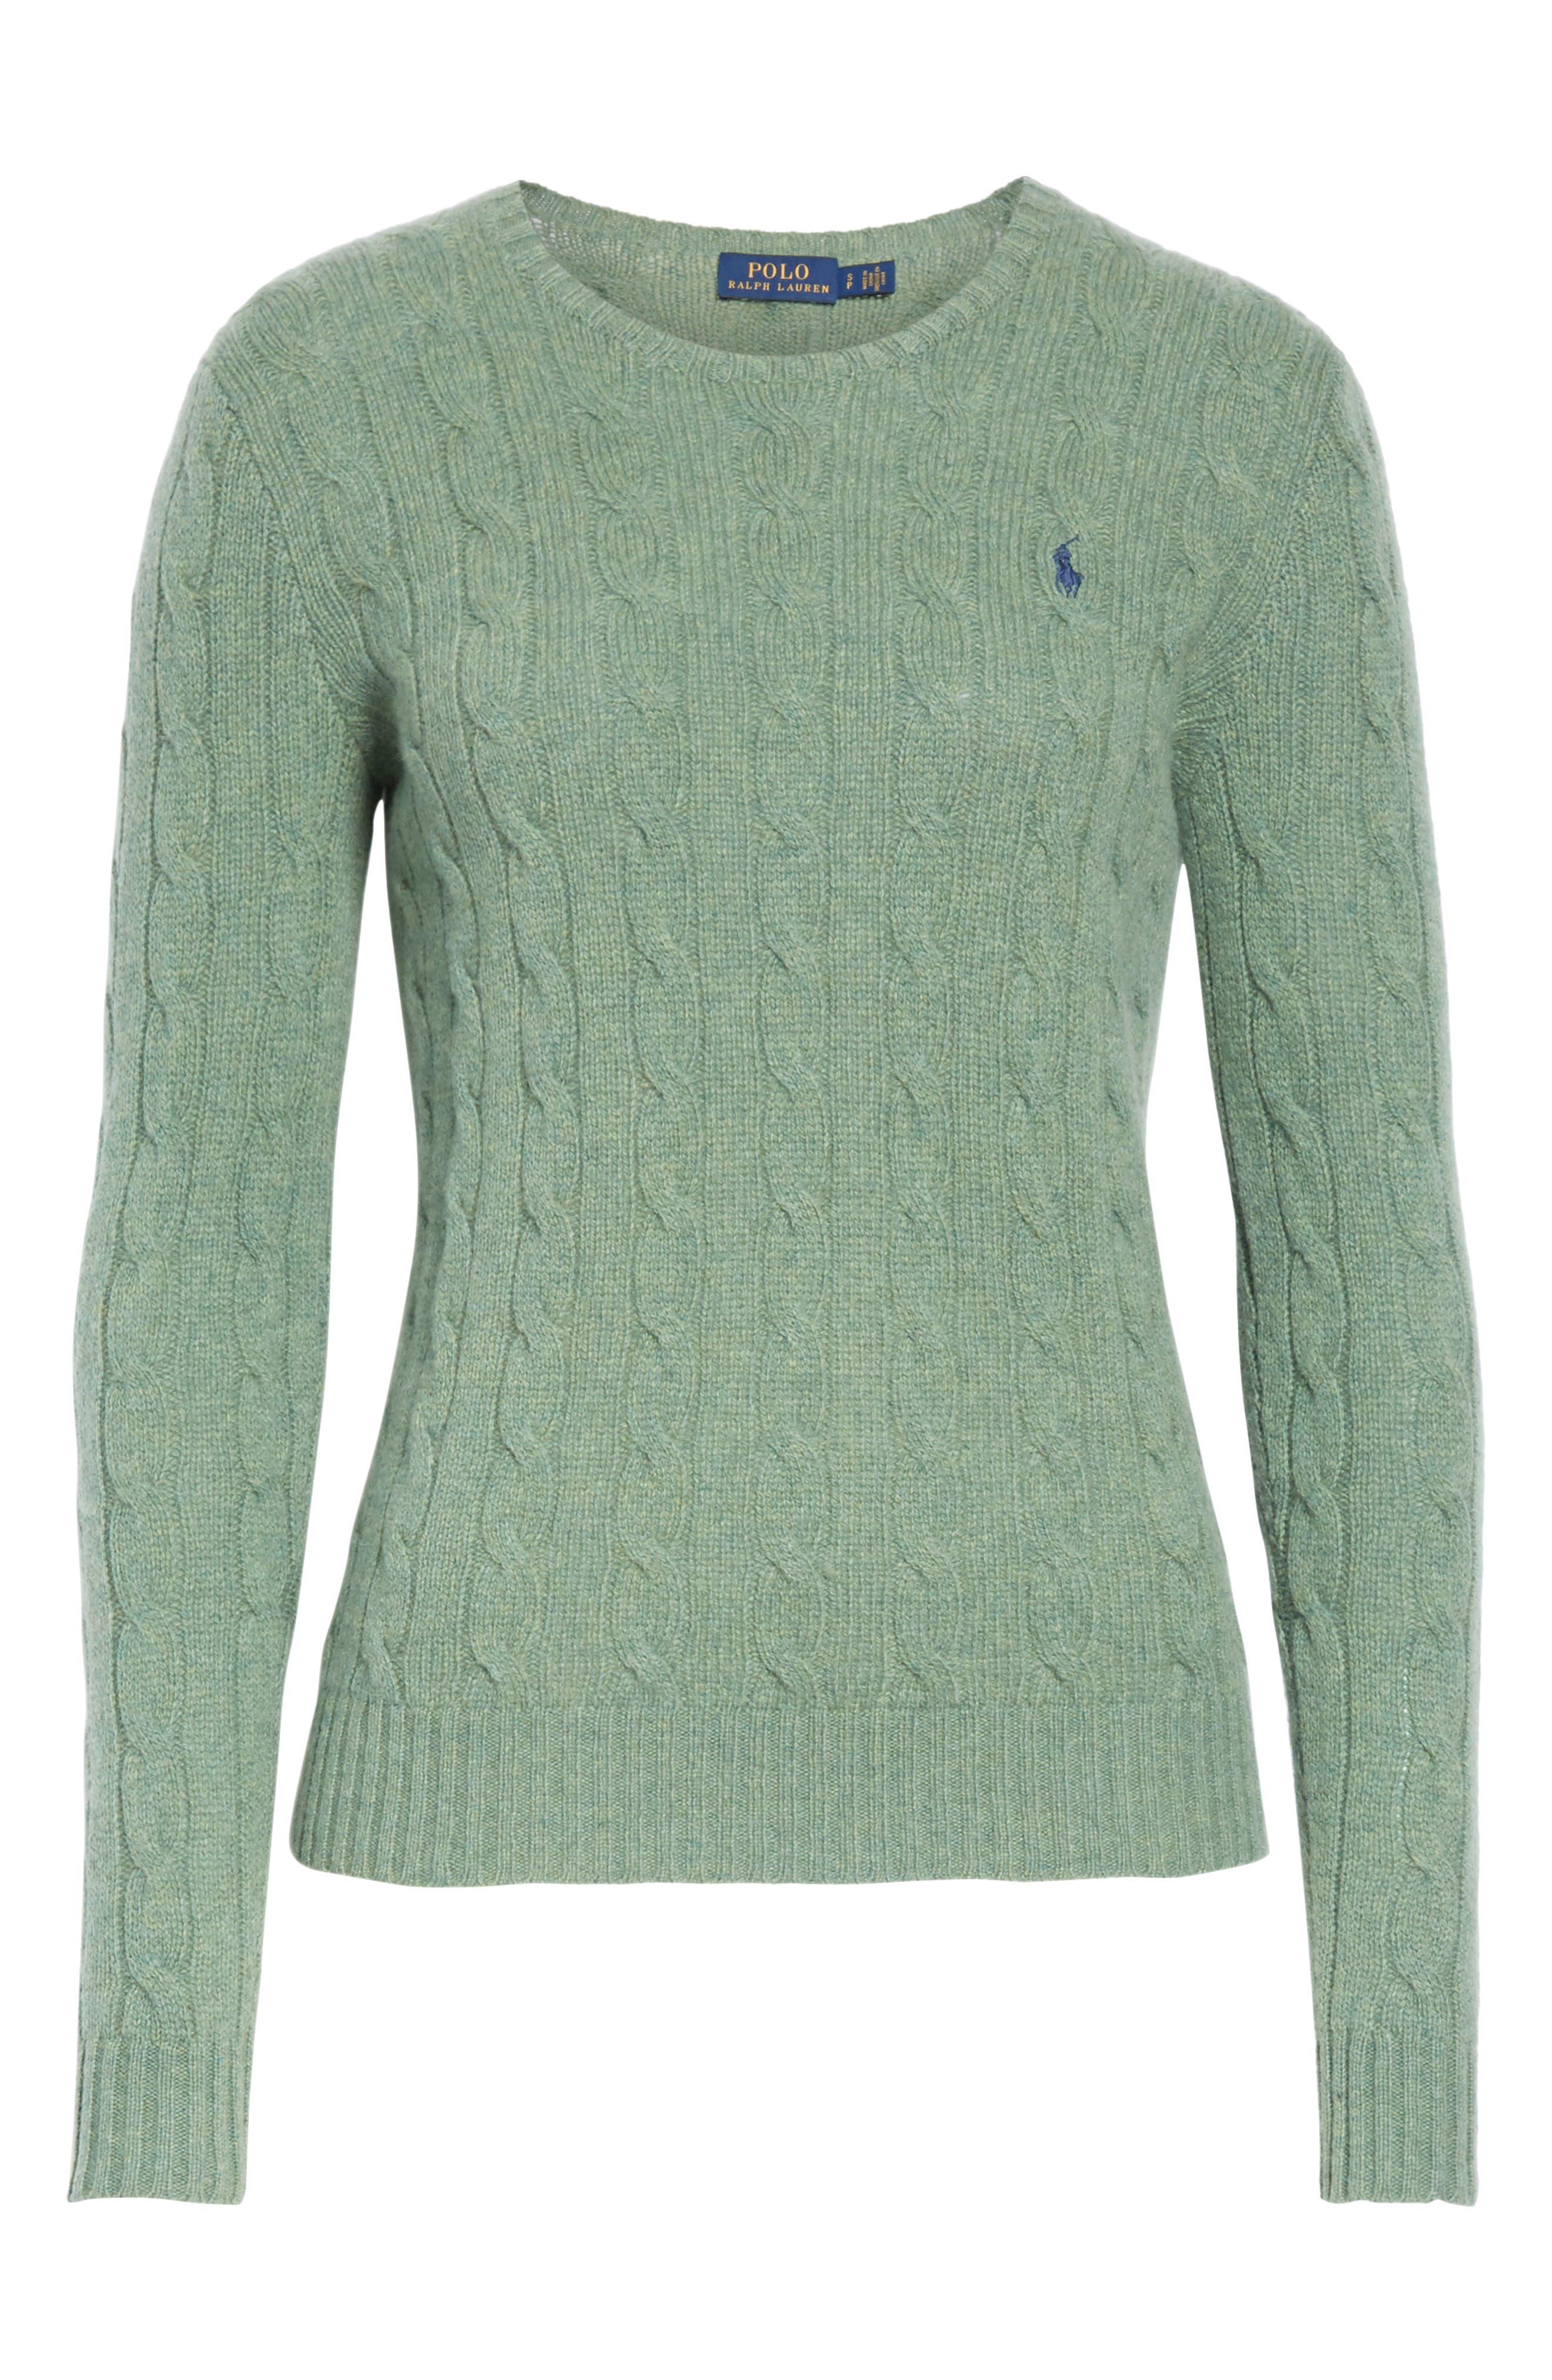 POLO RALPH LAUREN, Cable Knit Cotton Sweater, Alternate thumbnail 6, color, 300